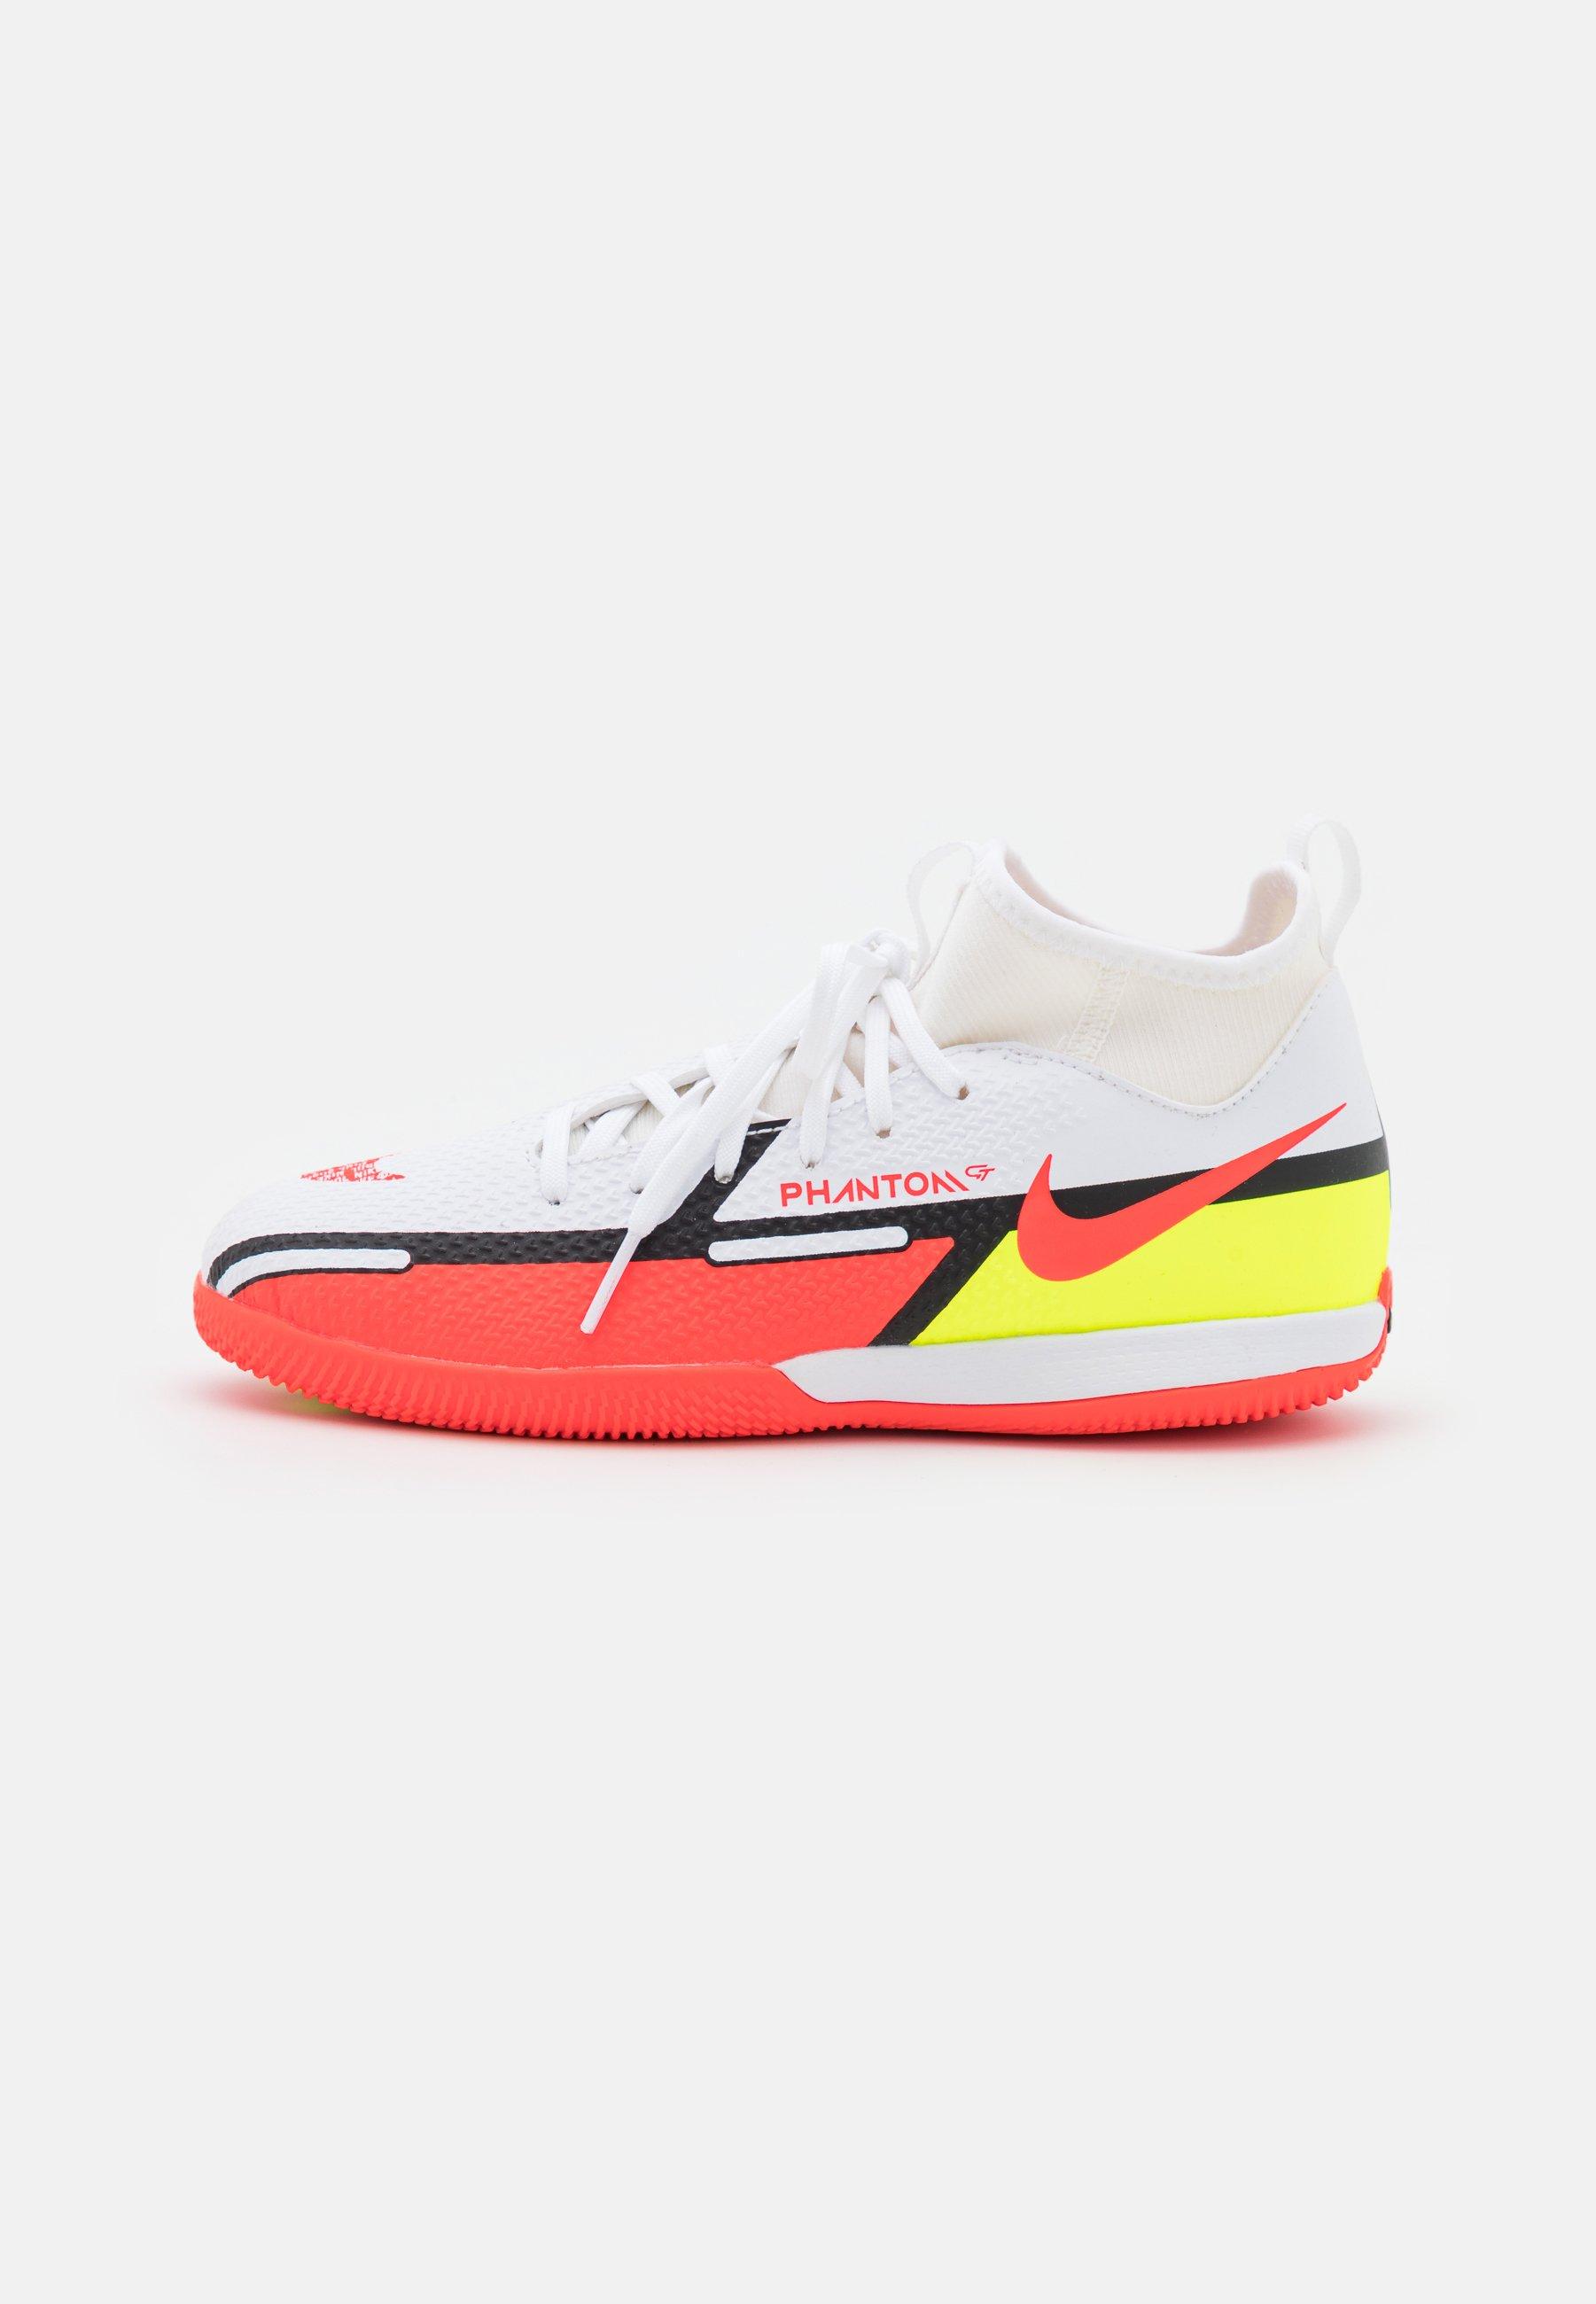 Enfant JR. PHANTOM GT2 ACADEMY DYNAMIC FIT IC UNISEX - Chaussures de foot en salle